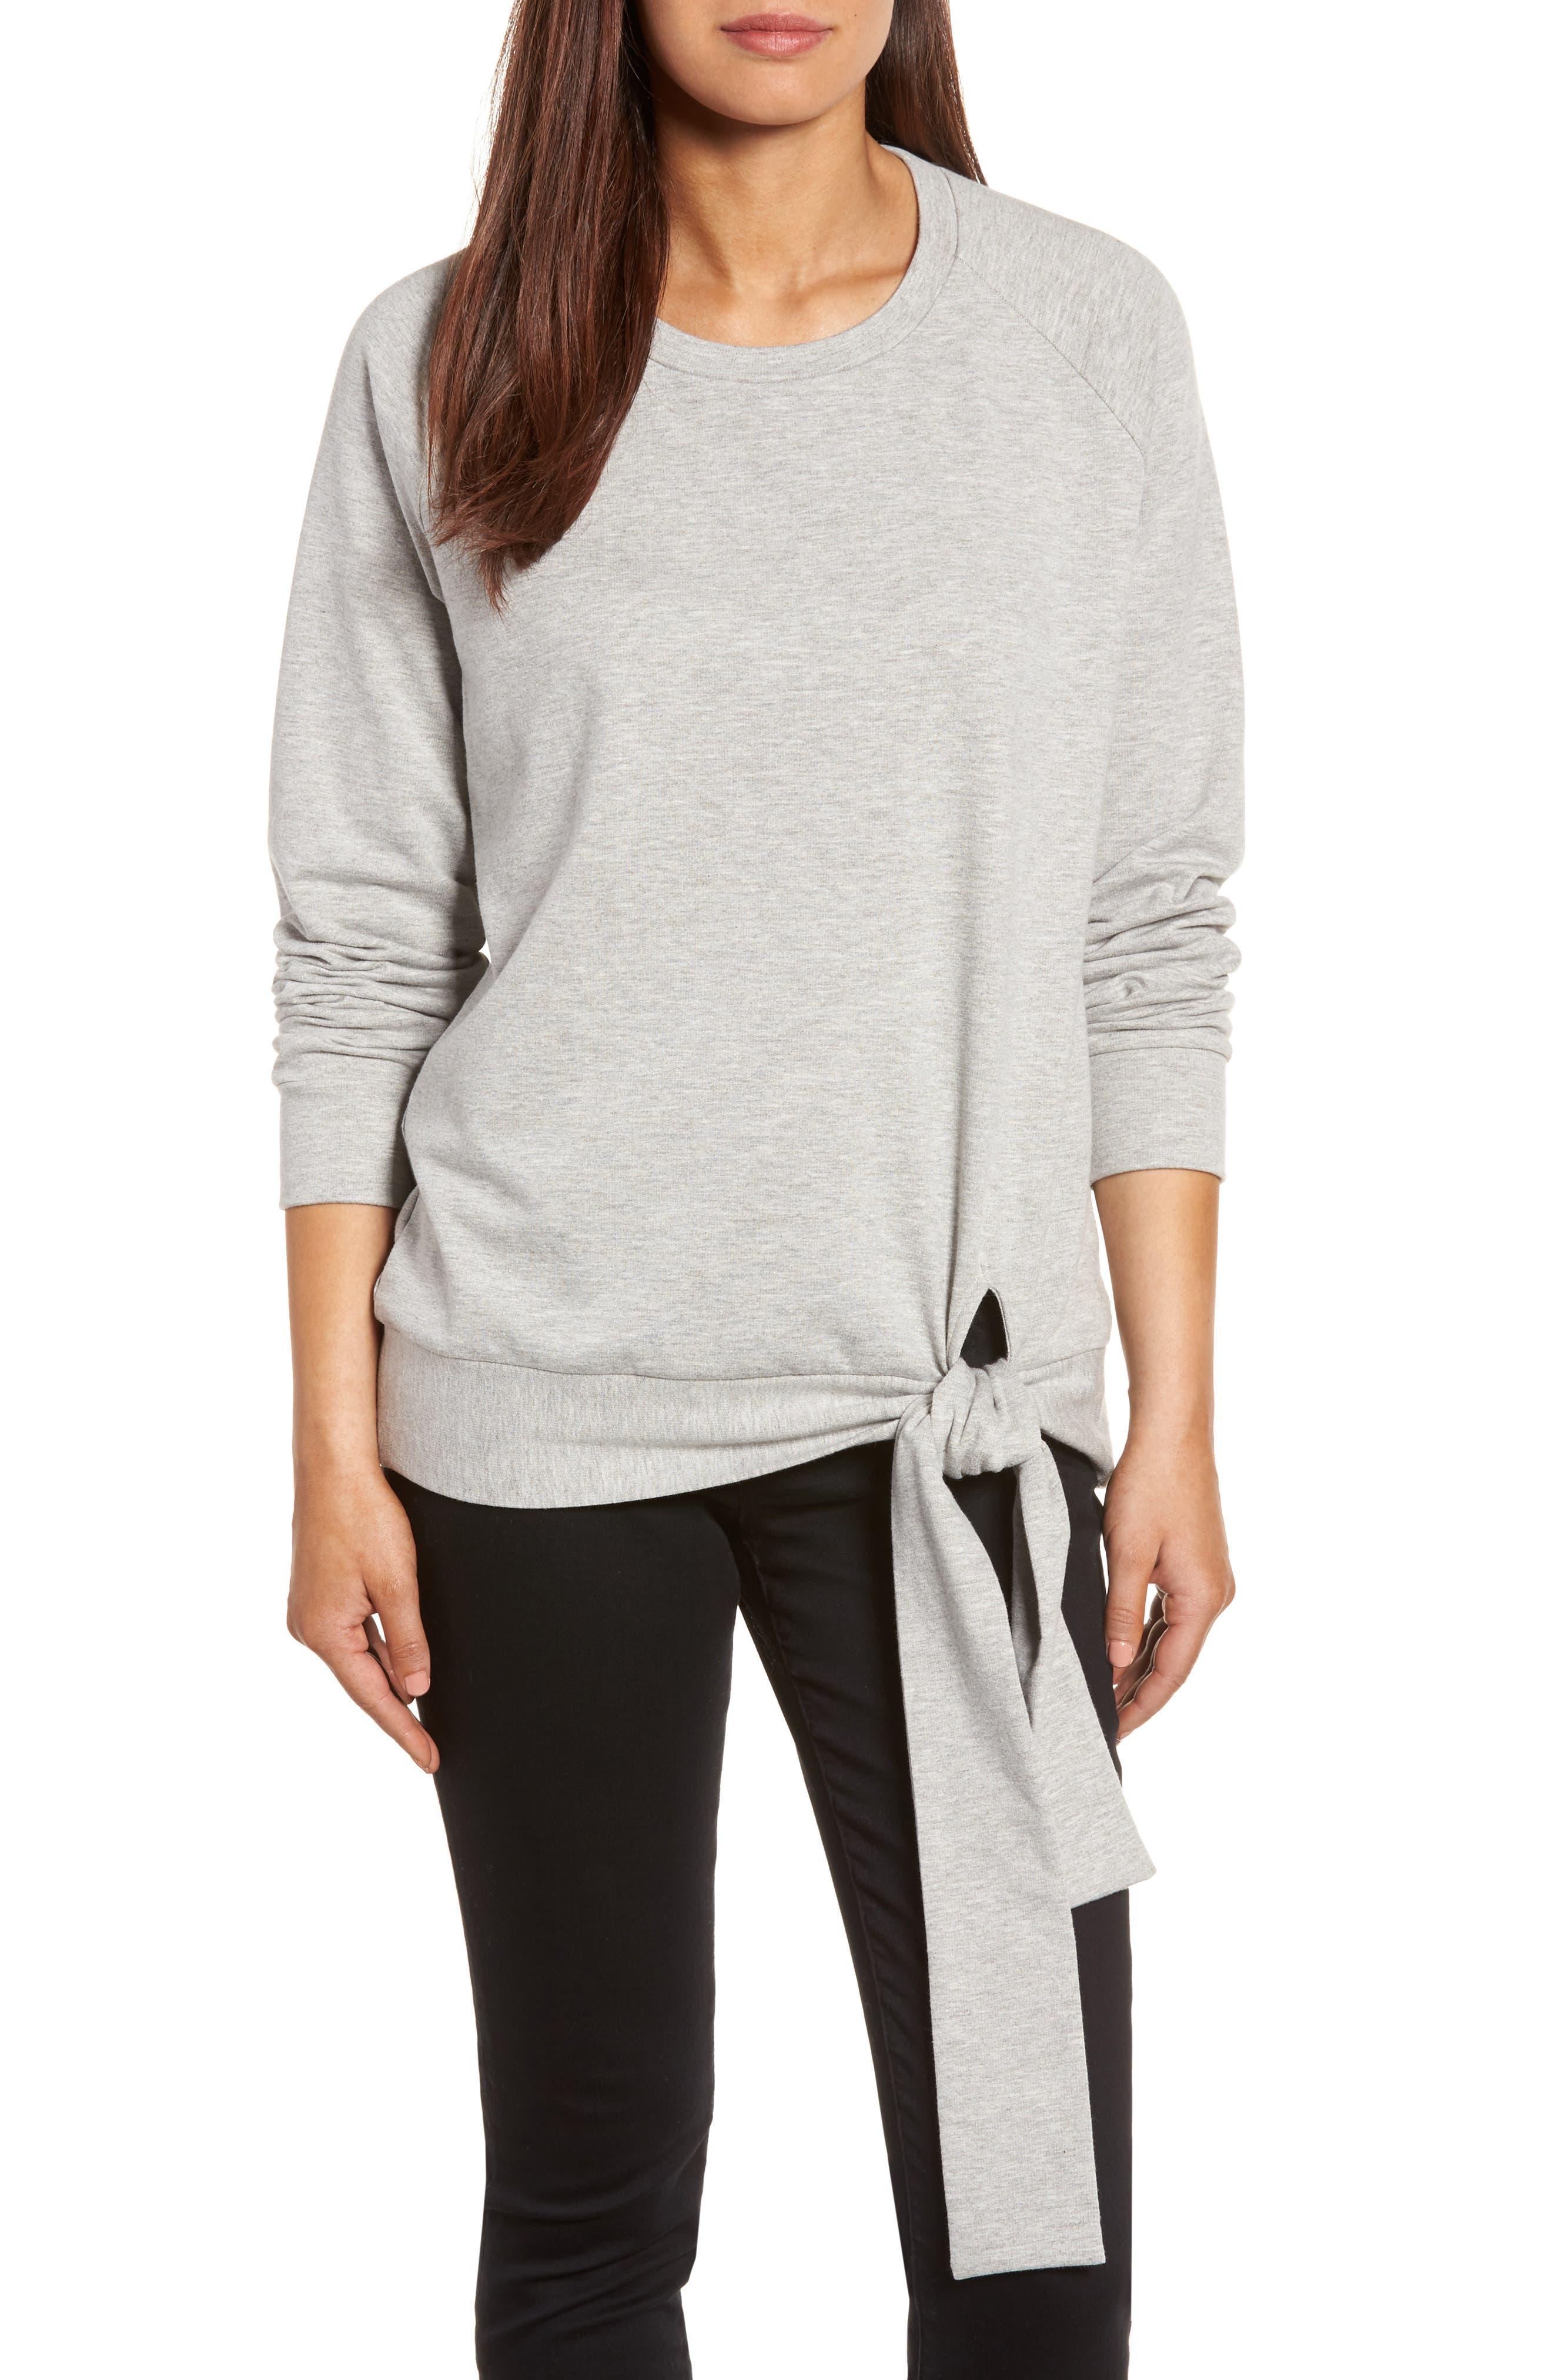 Alternate Image 1 Selected - Caslon® Tie Knot Sweatshirt (Regular & Petite)